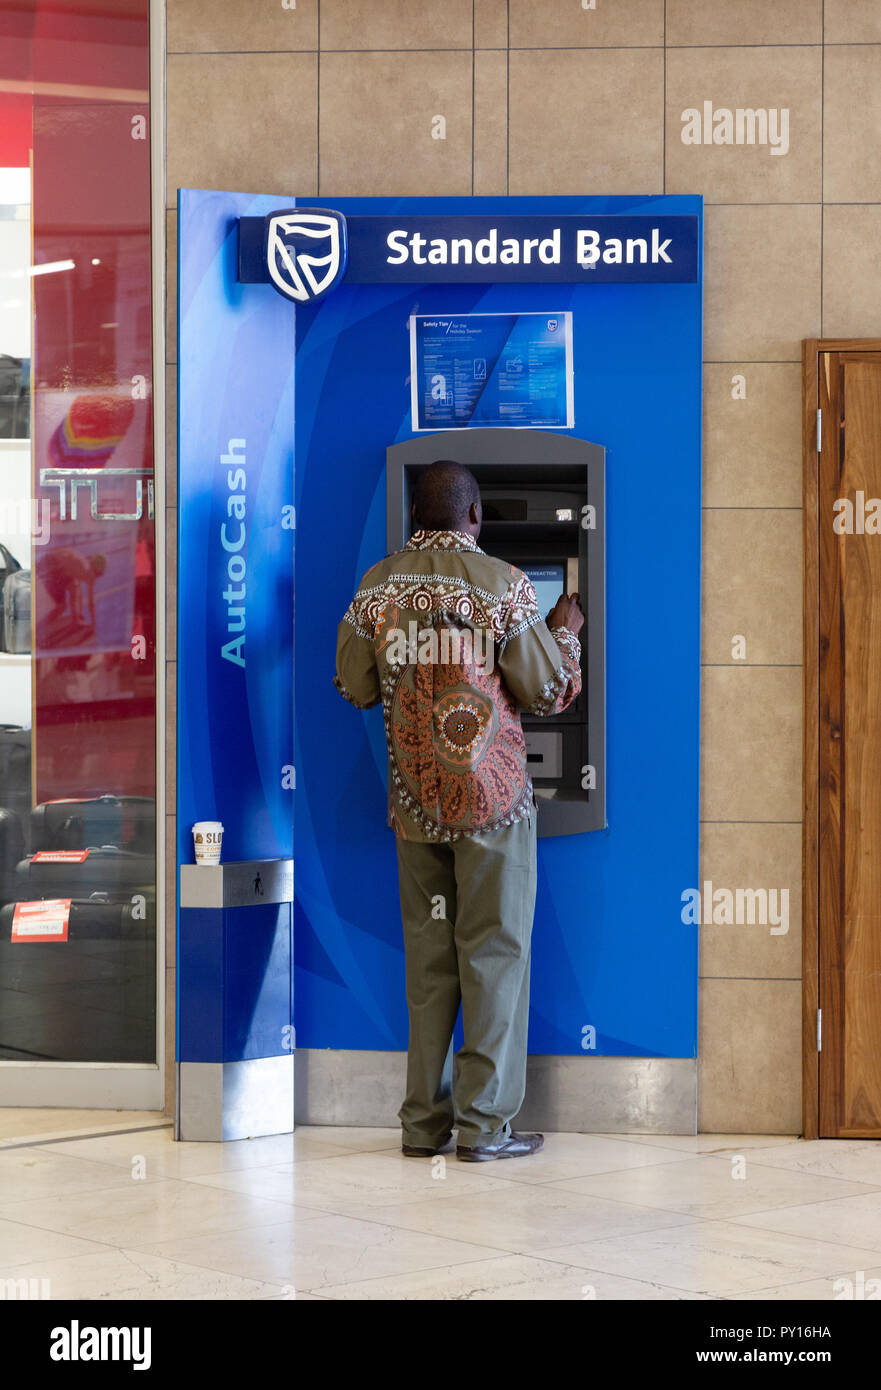 Namibia bank ATM - a namibian man using a Standard Bank cash machine, Windhoek, Namibia Africa - Stock Image